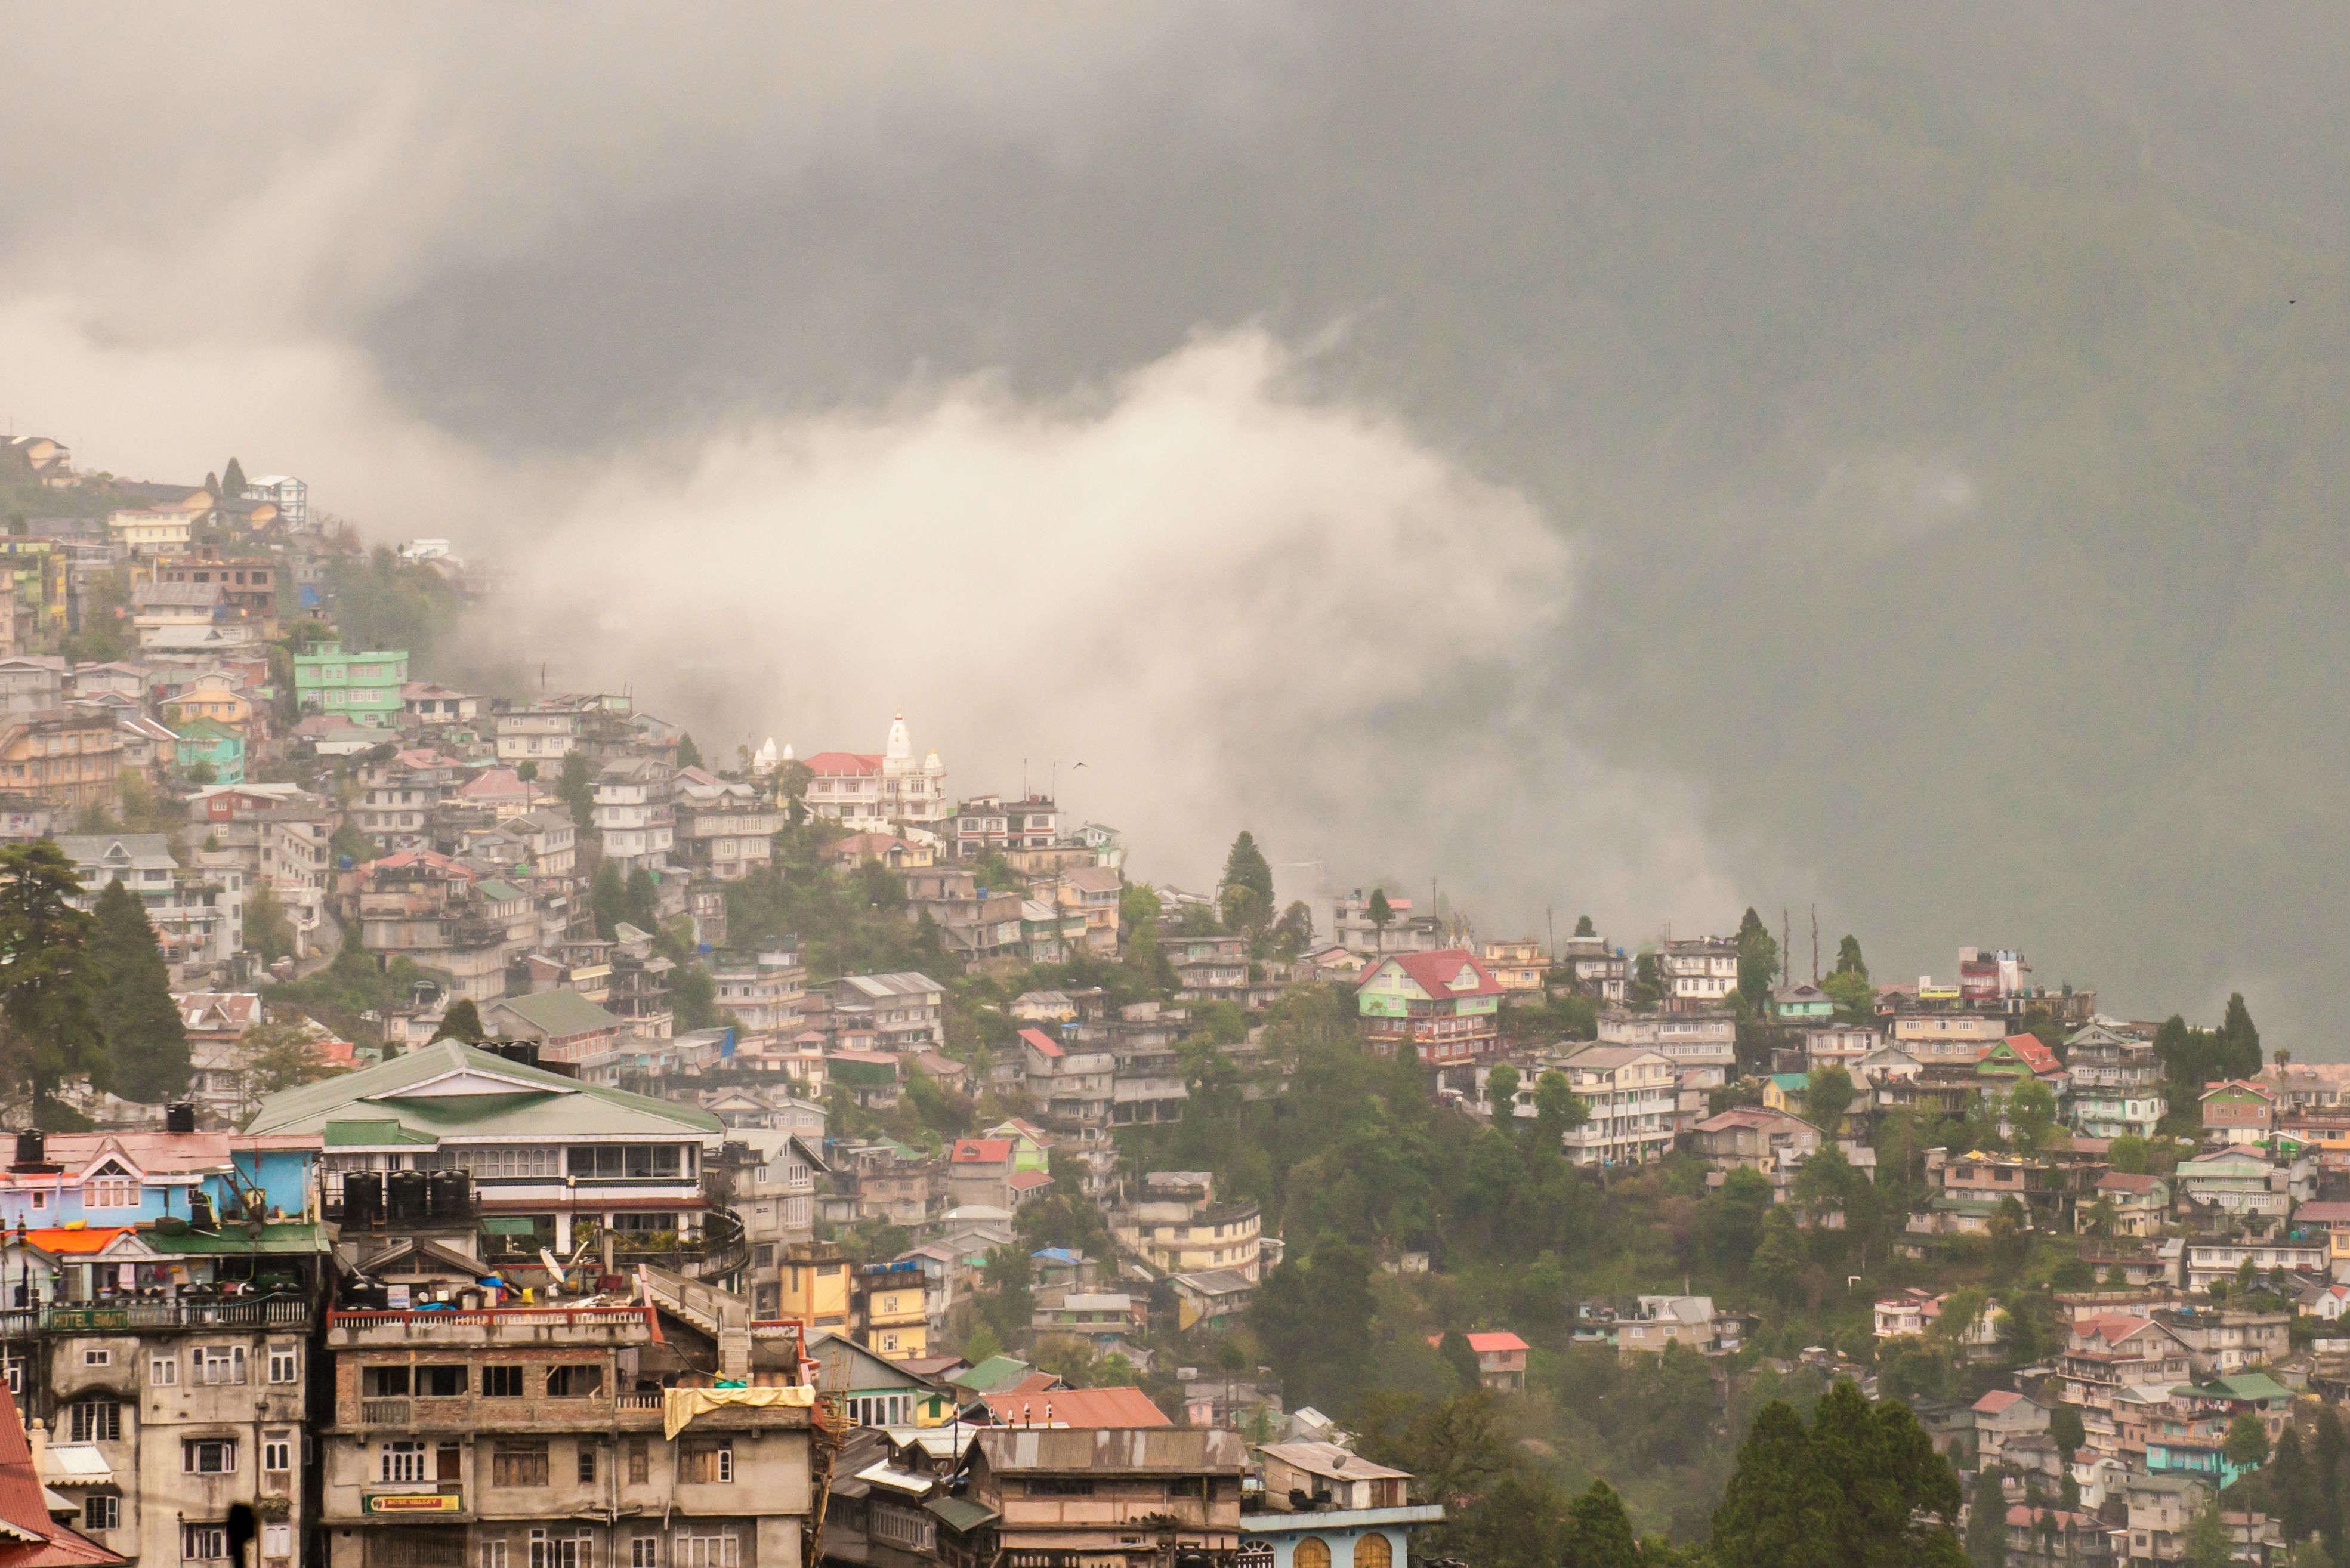 Bar hopping in Darjeeling